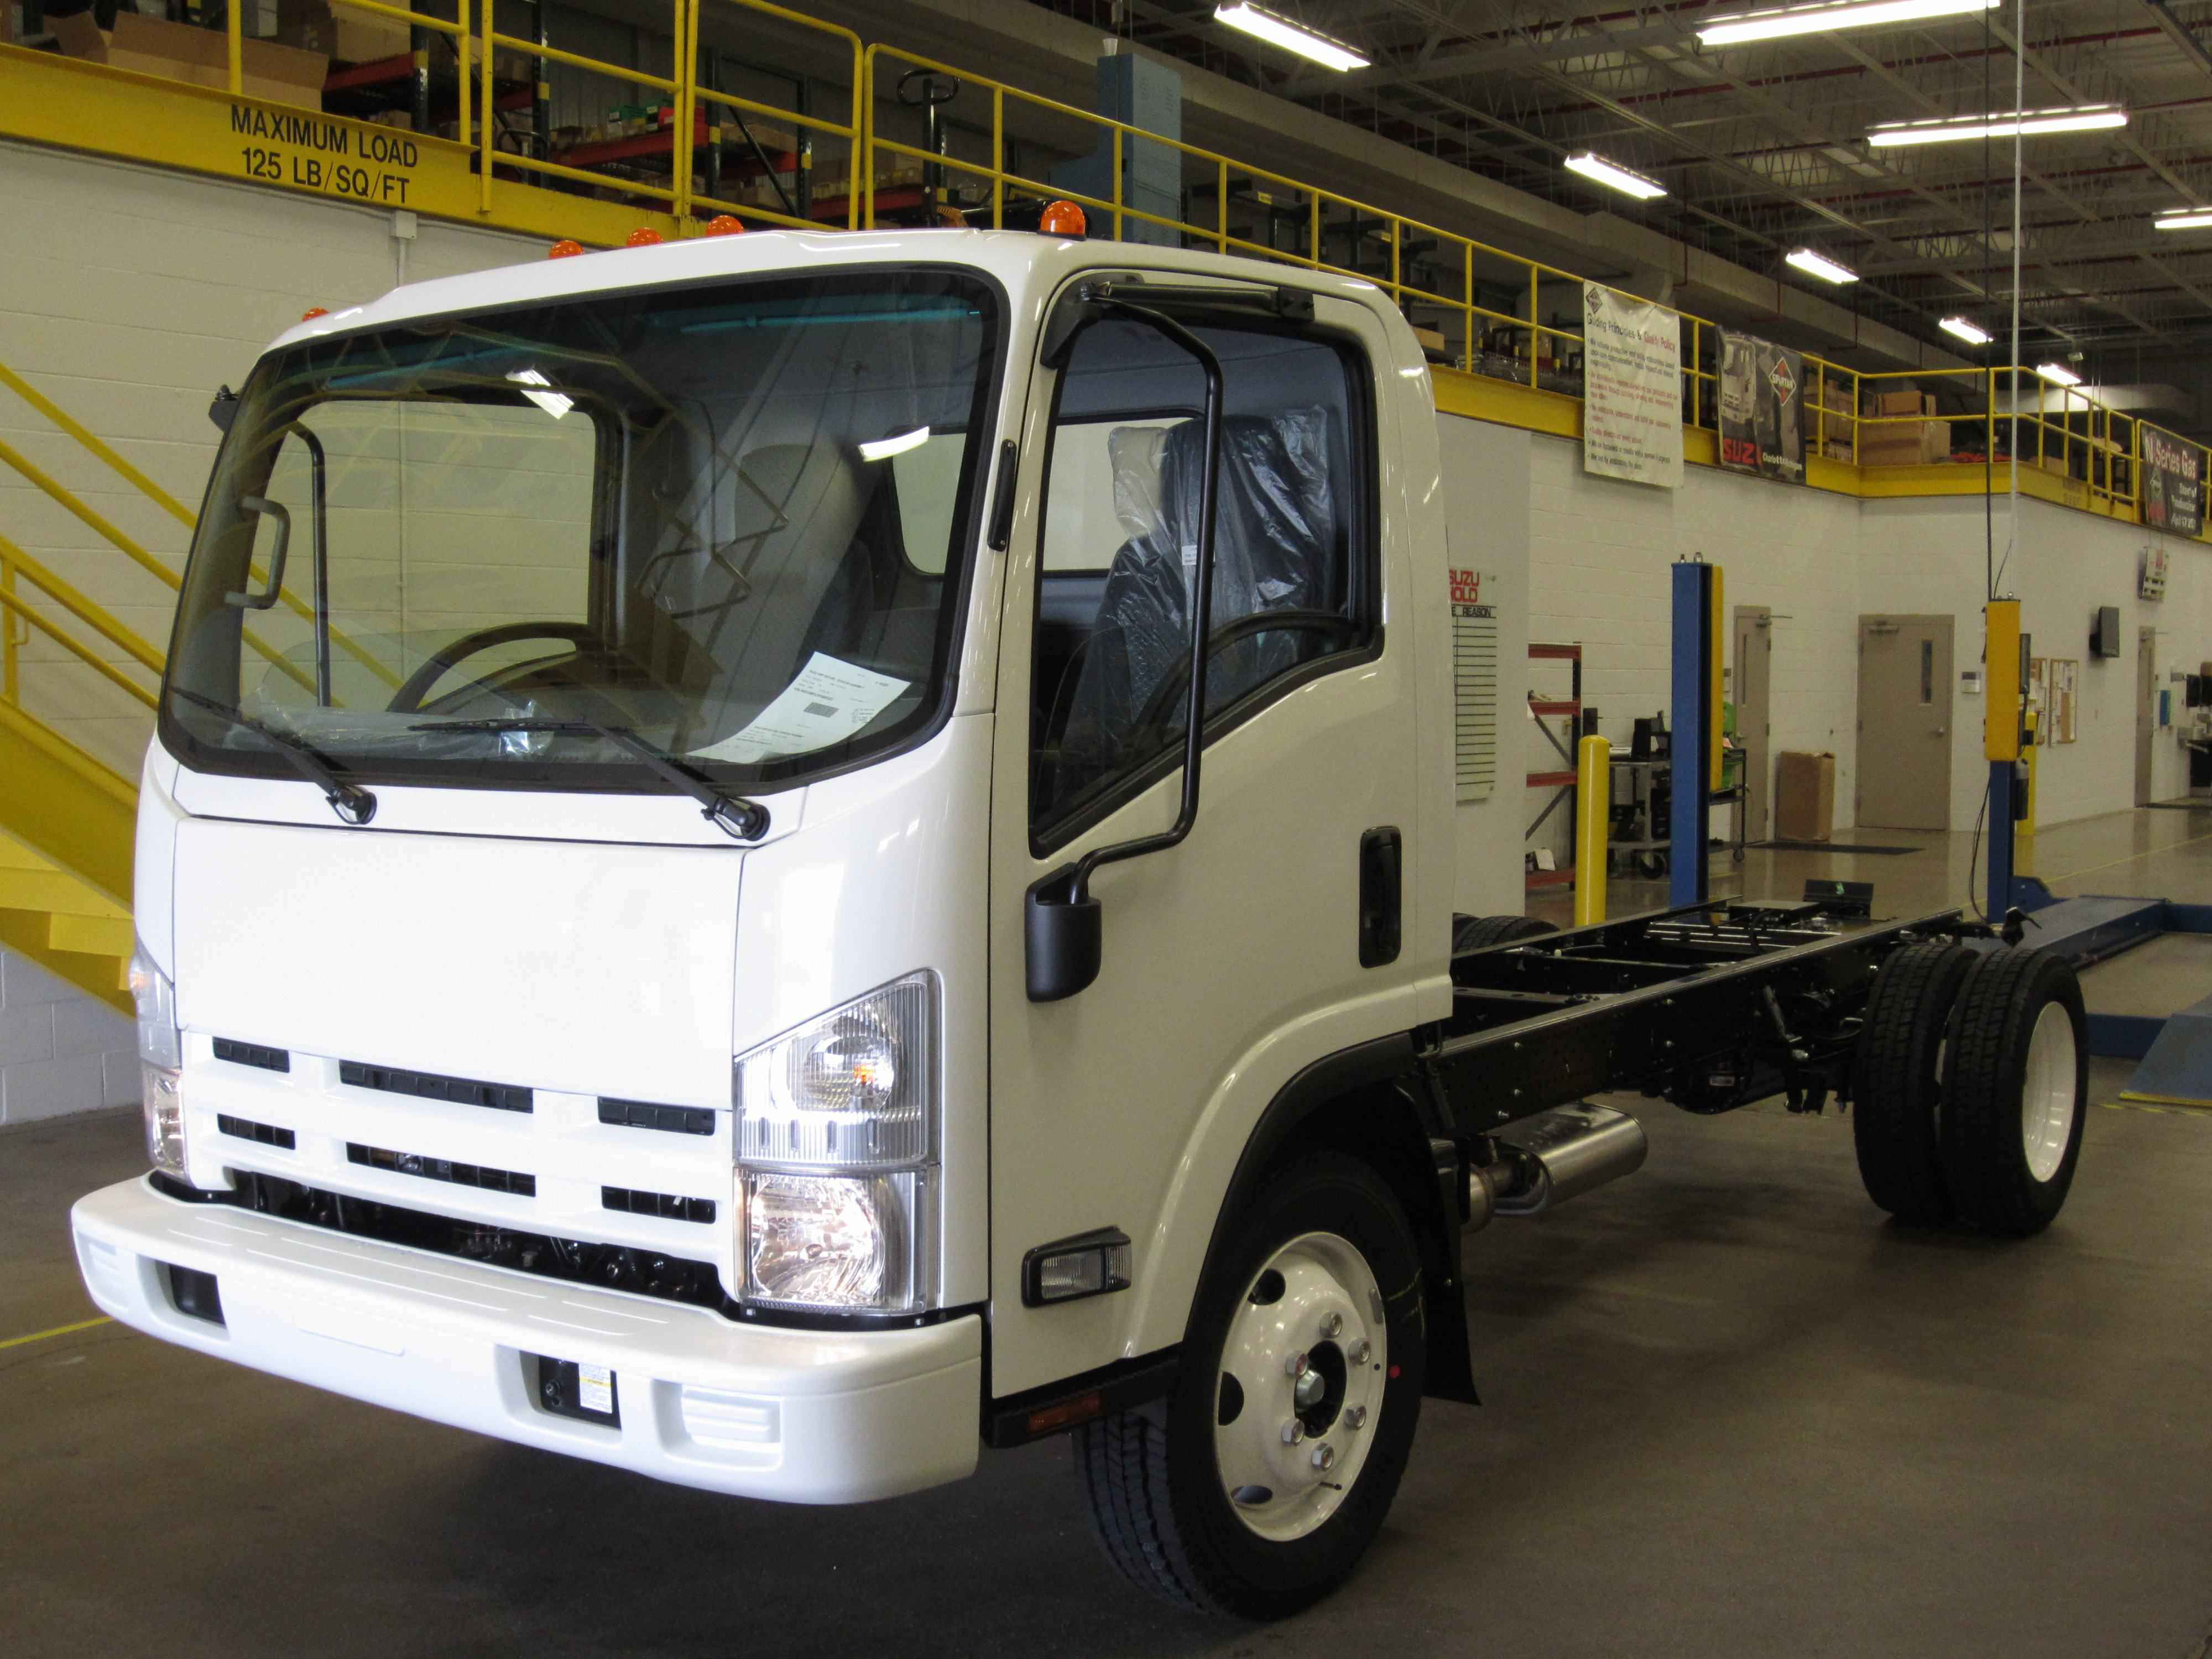 Isuzu celebrates 20,000 unit milestone for N-Series gas-powered Cabover